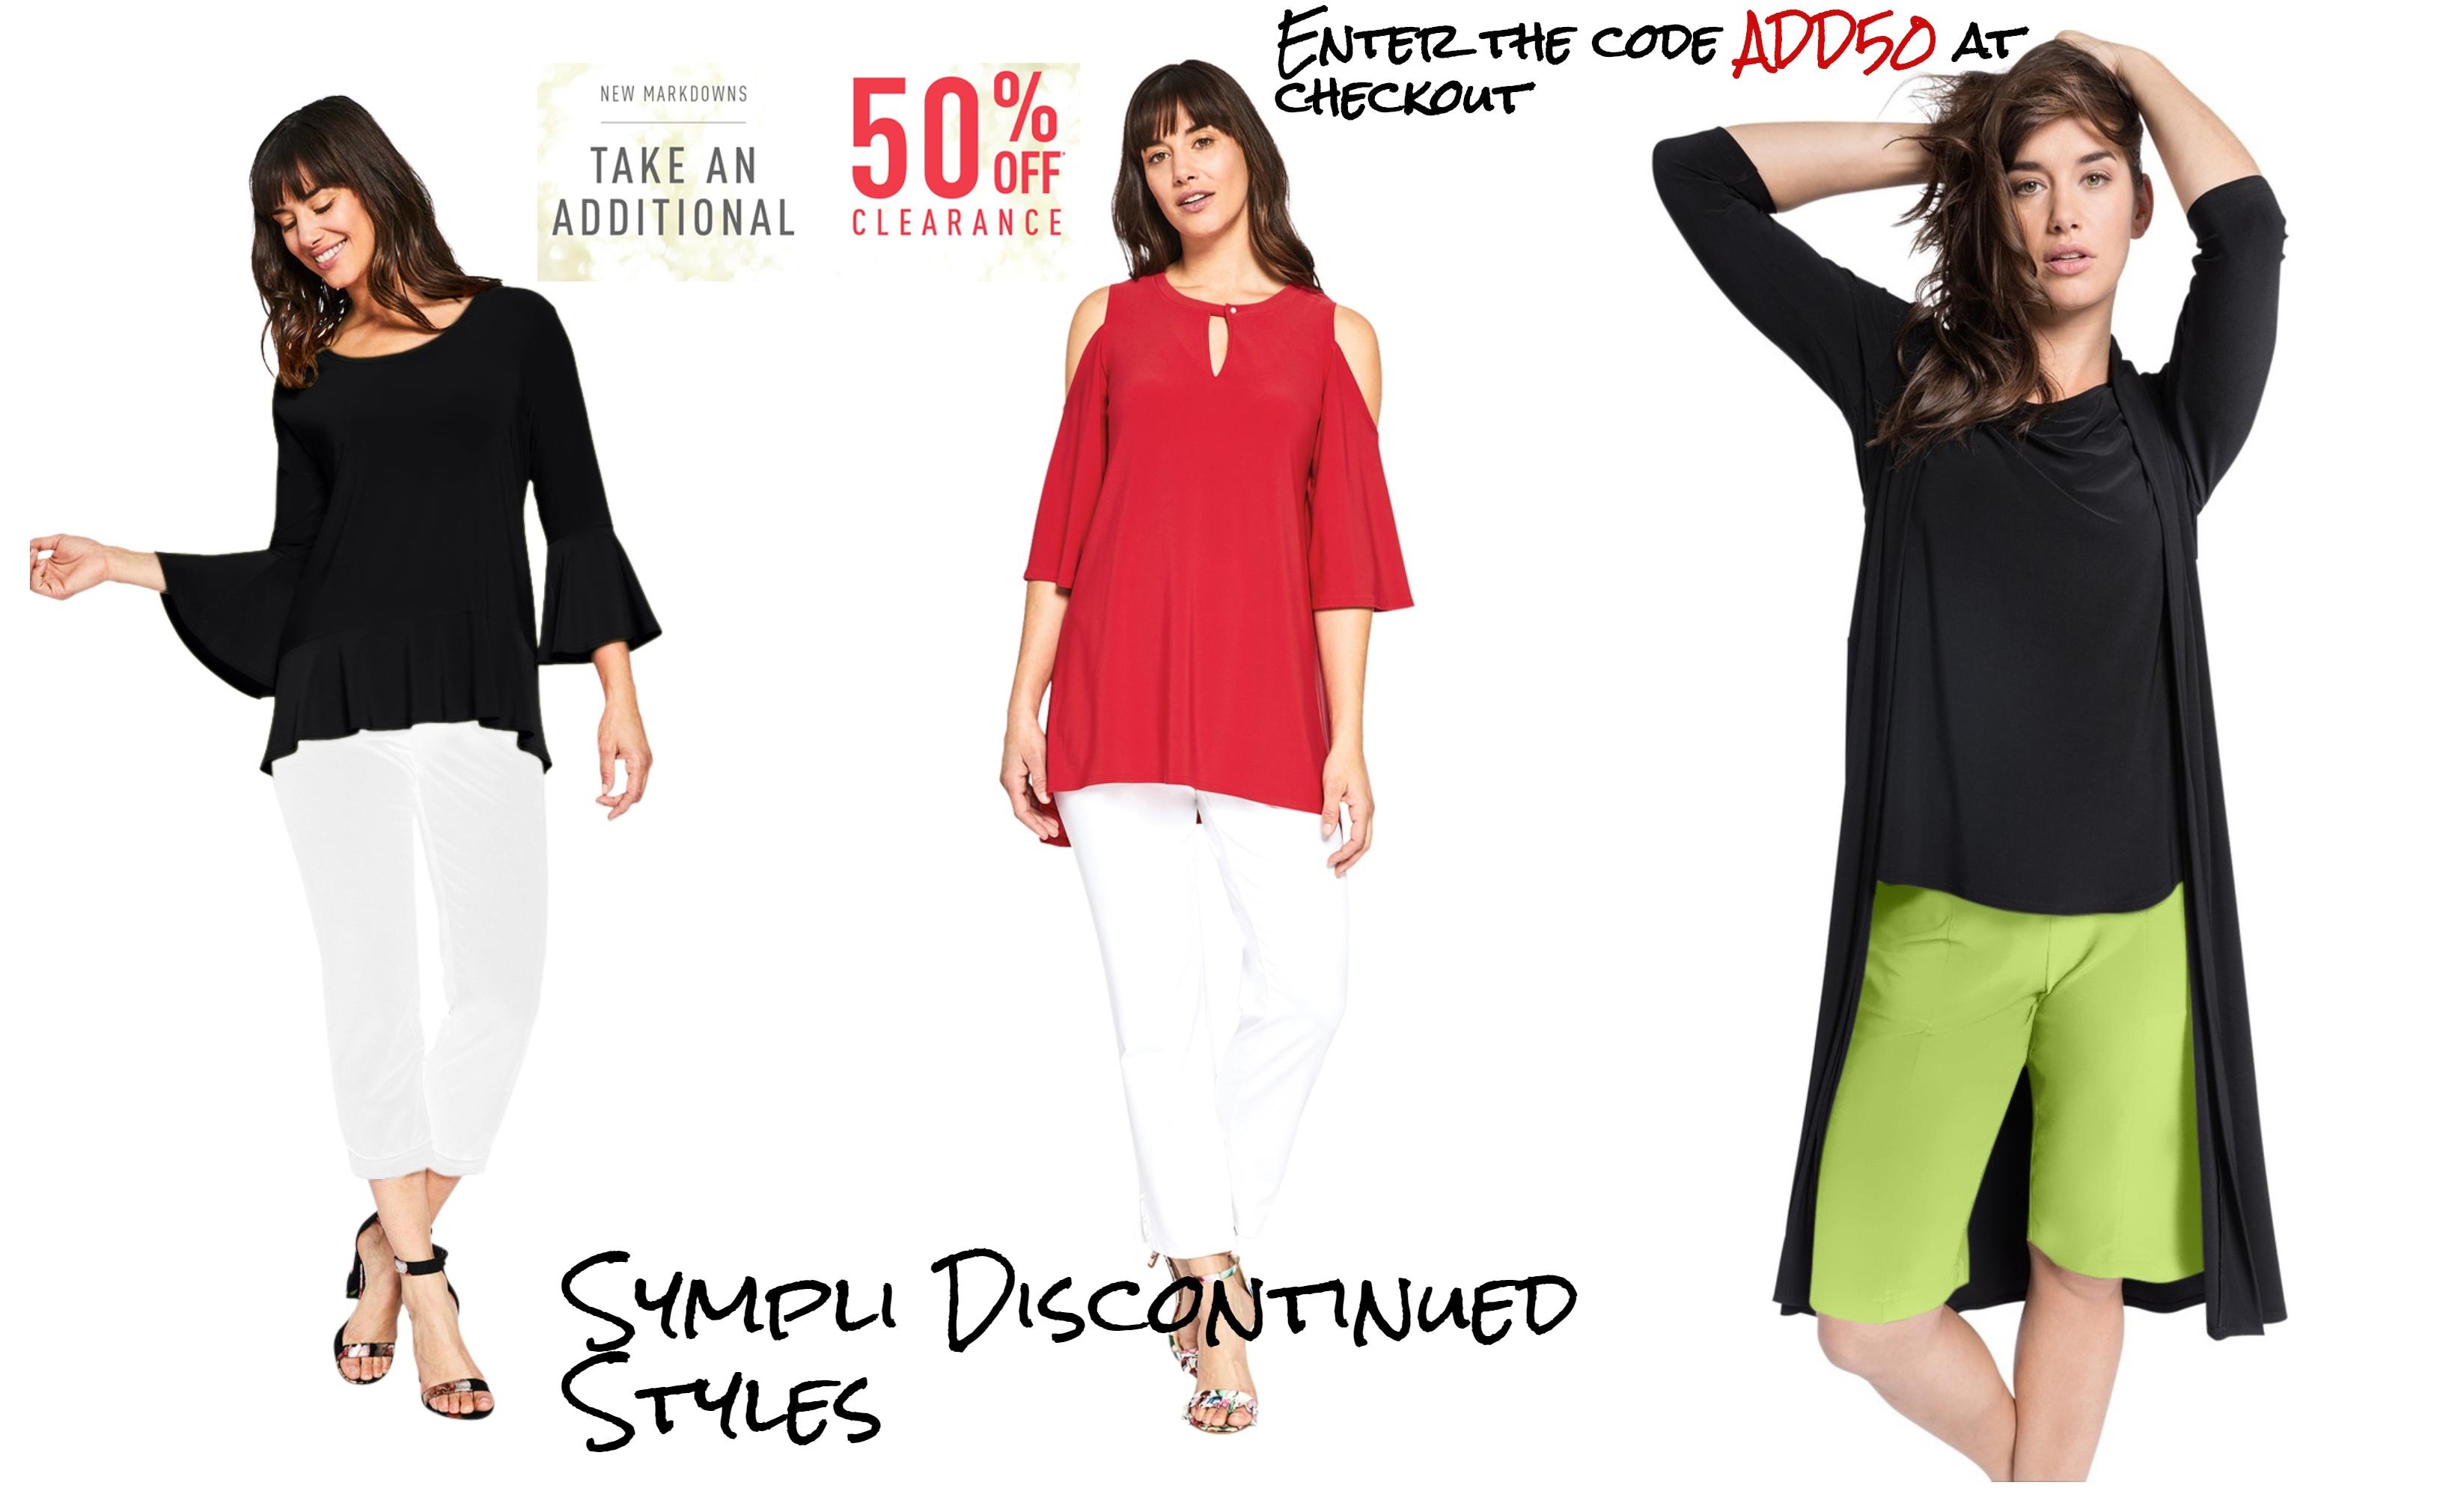 sympli-discontinued-styles-2-.jpg